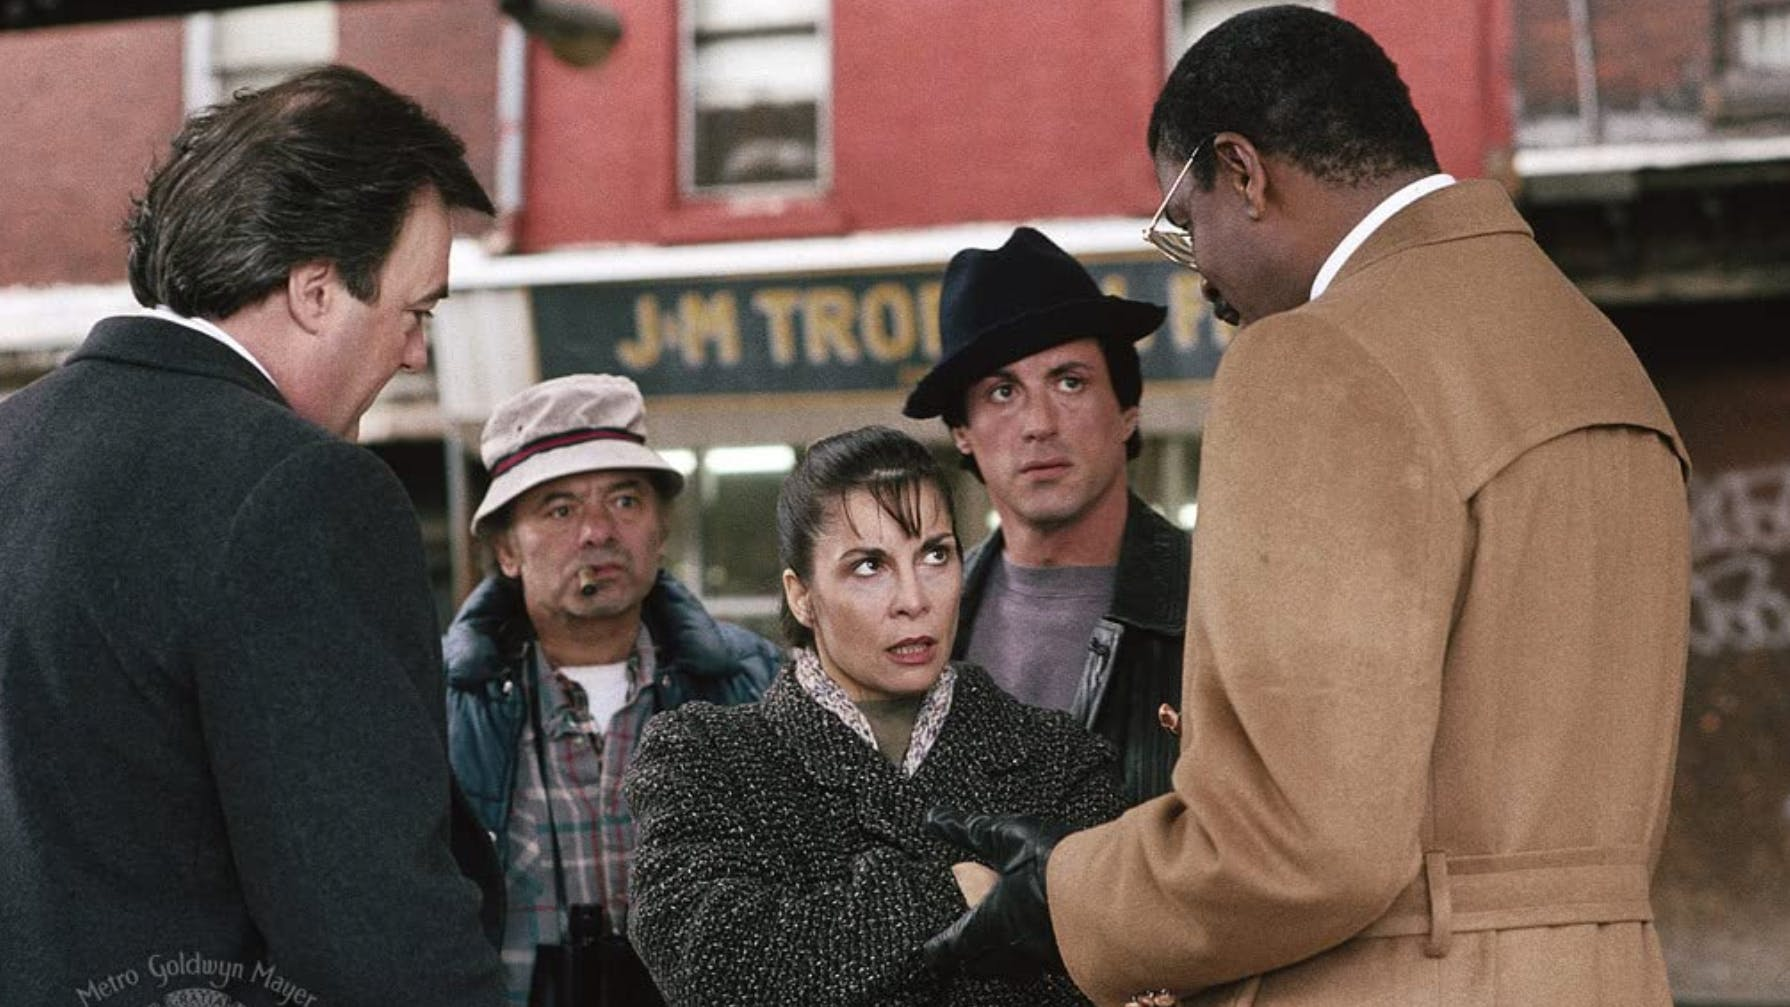 «Rocky V» (1990): Der Herr ganz rechts zitiert Mark Twain, daraufhin fragt Paulie (Burt Young, 2.v.l.), wer das sei. «Er war ein Maler», antwortet ihm Rocky Balboa.